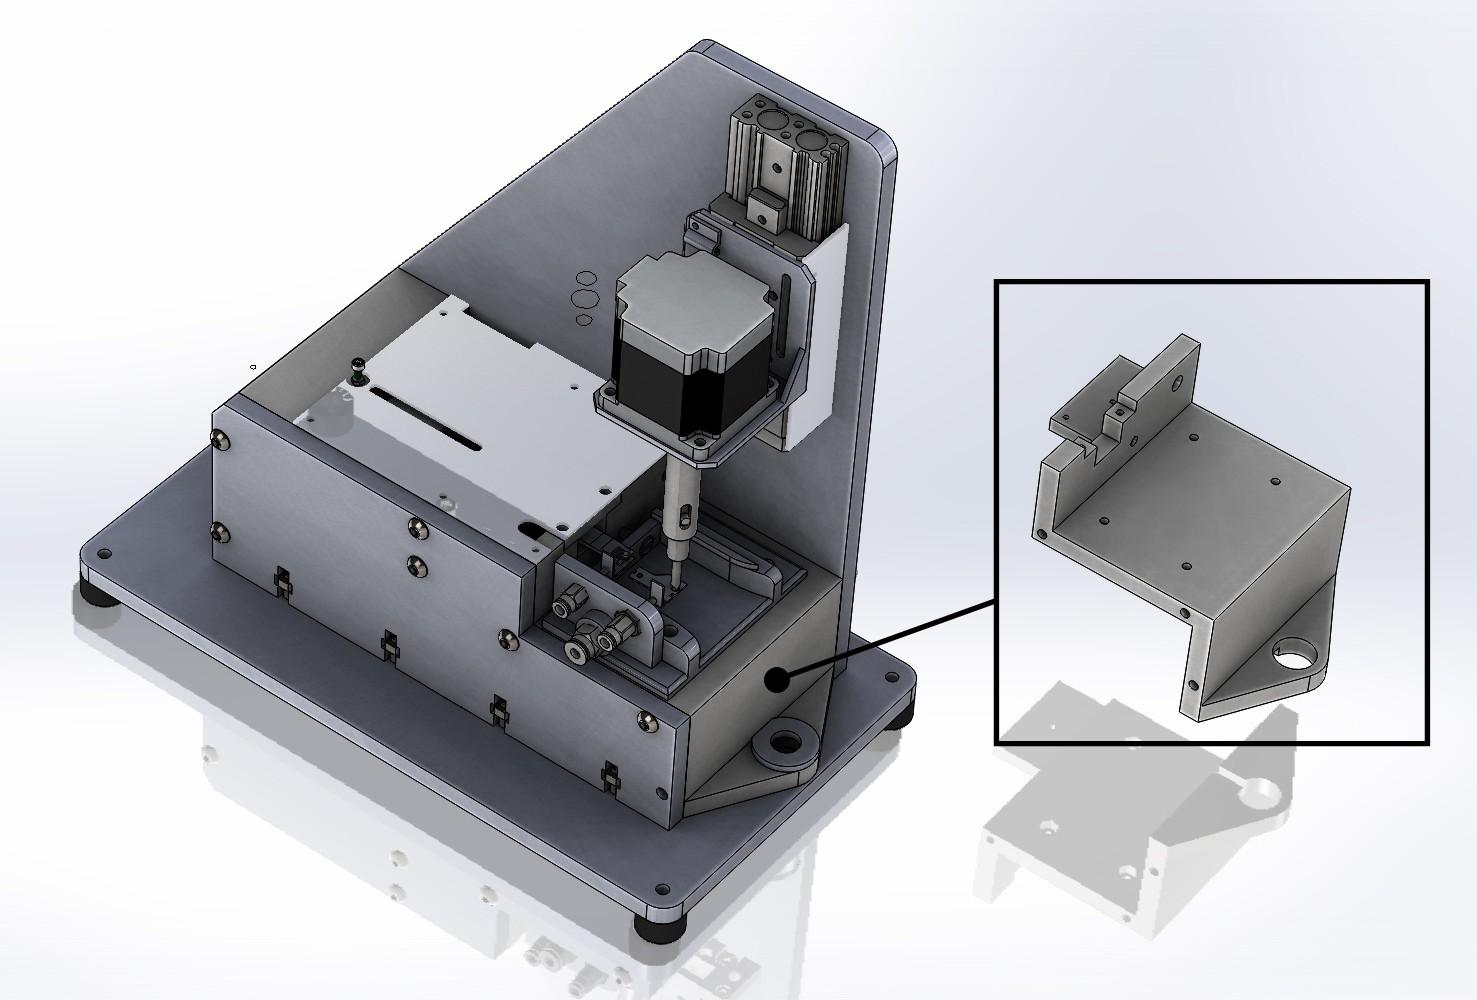 3D printed Loader assembly